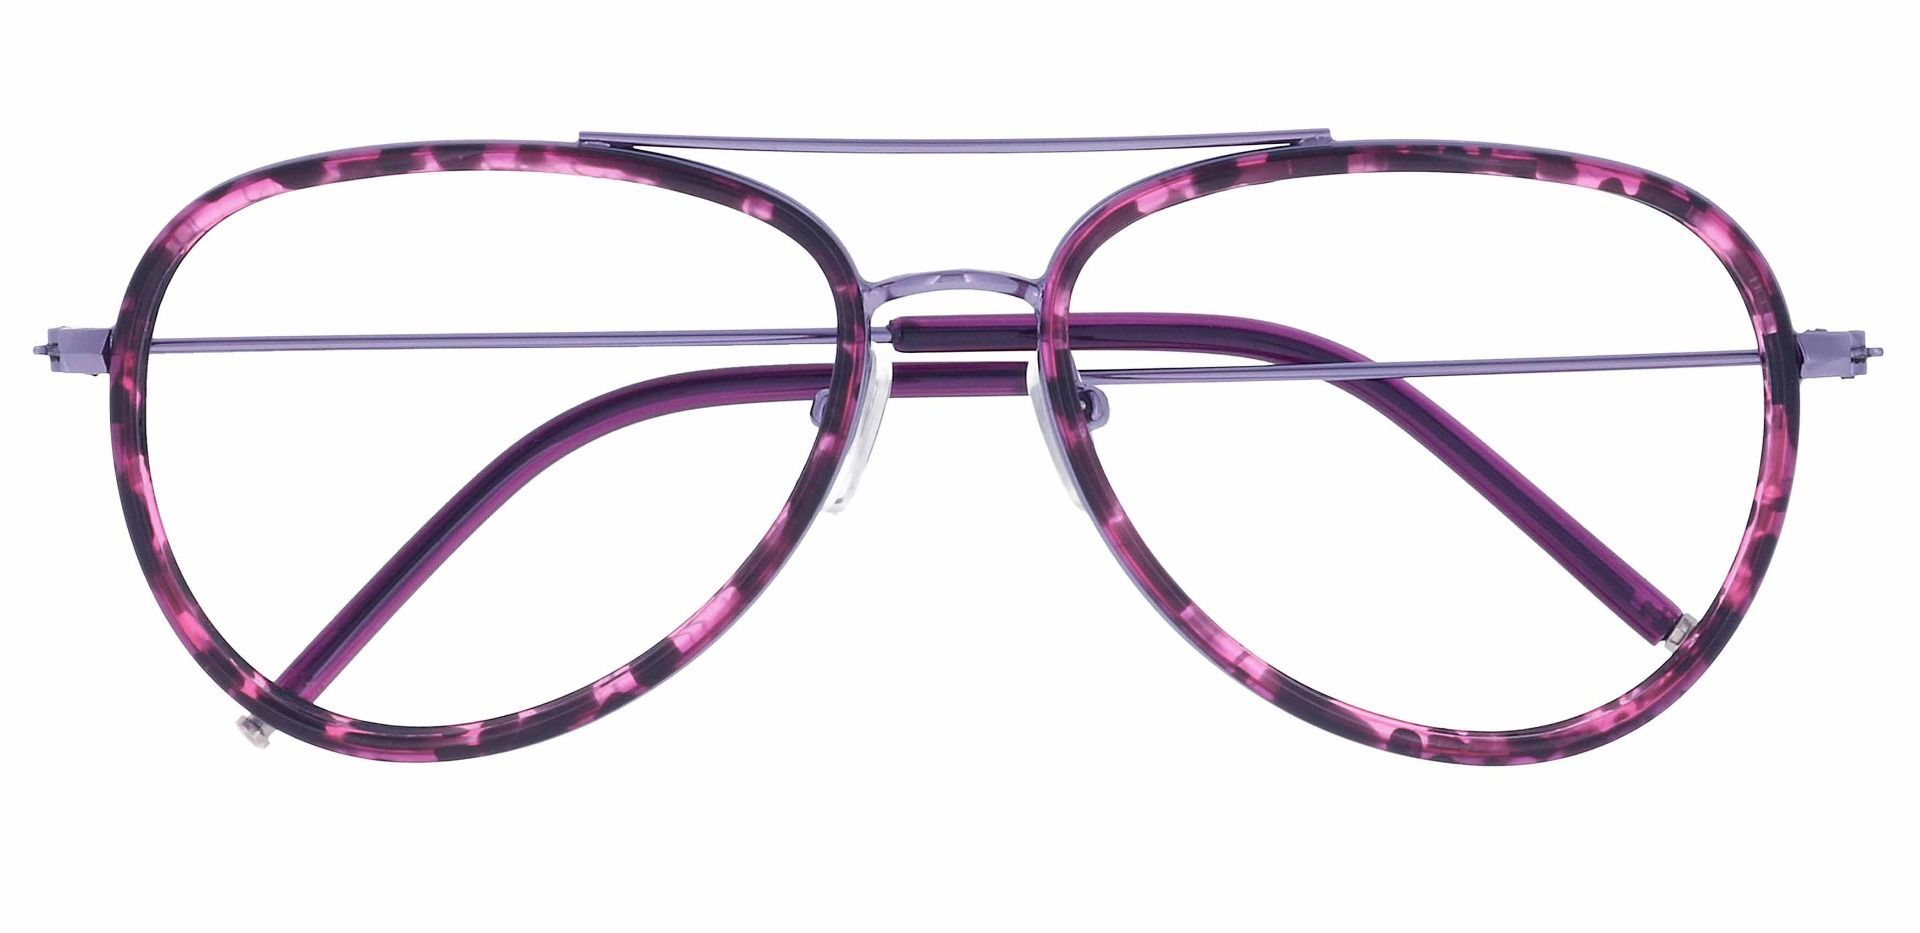 Ace Aviator Reading Glasses - Purple